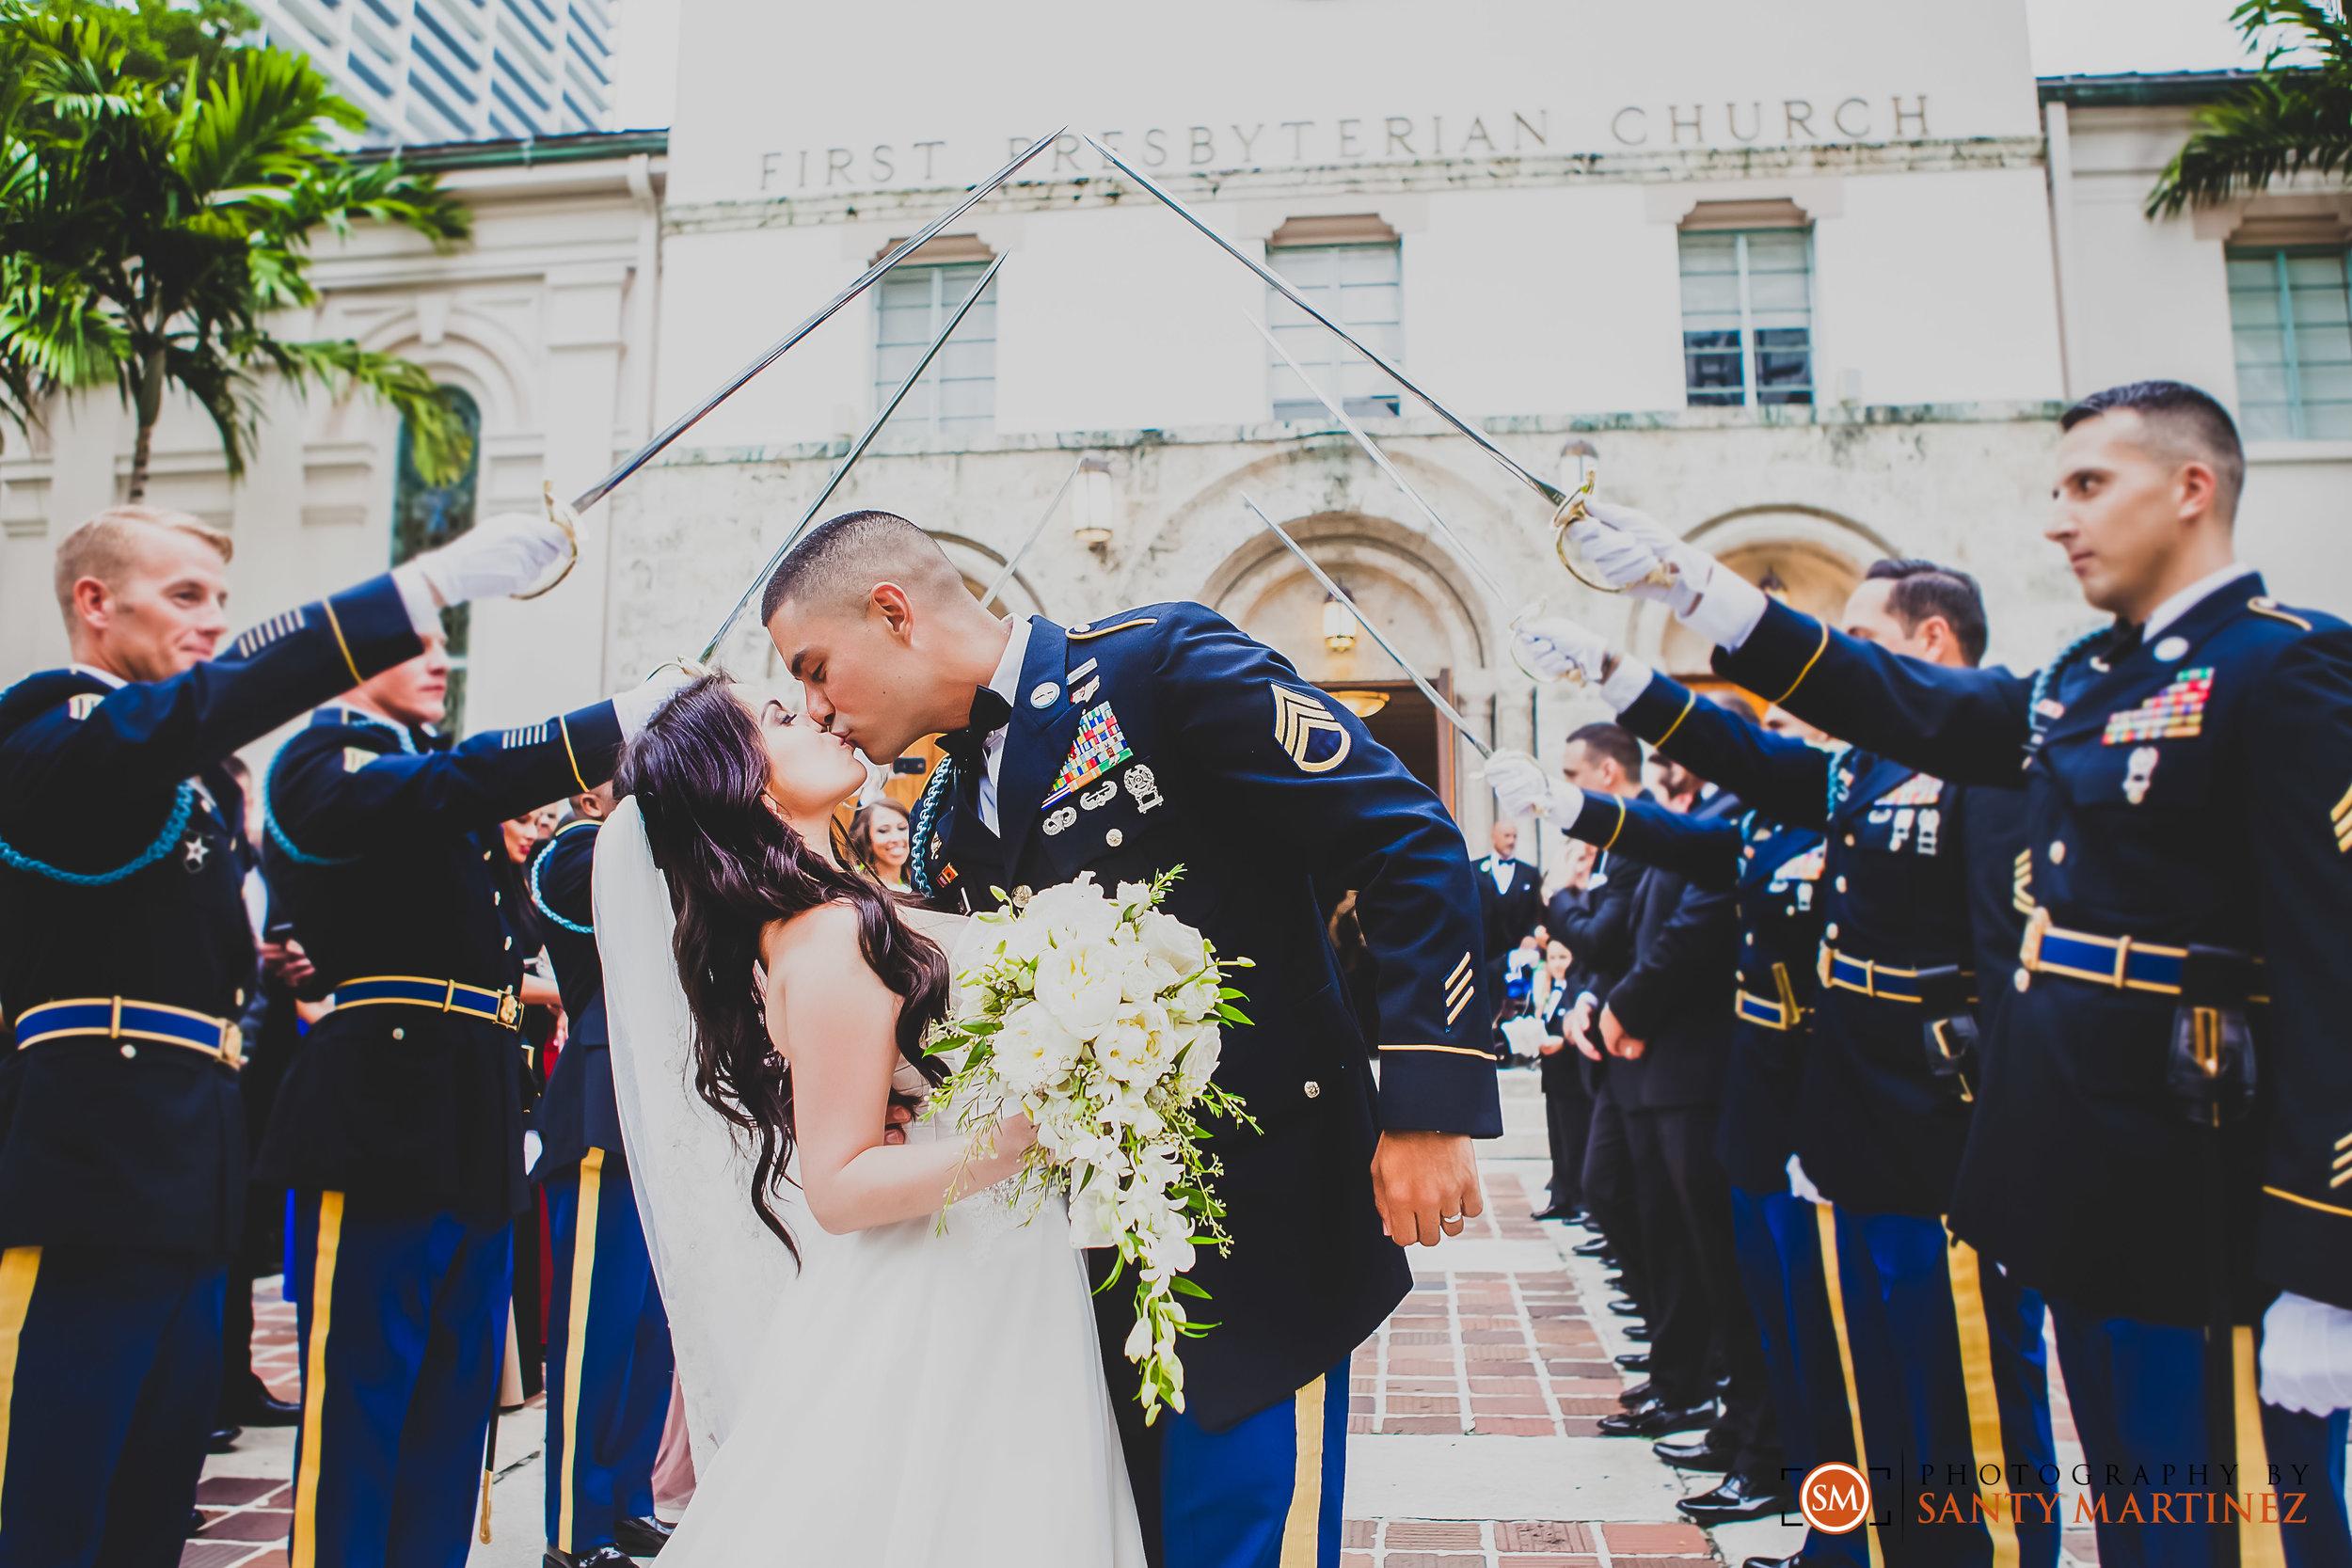 Wedding First Miami Presbyterian Church - Photography by Santy Martinez-25.jpg